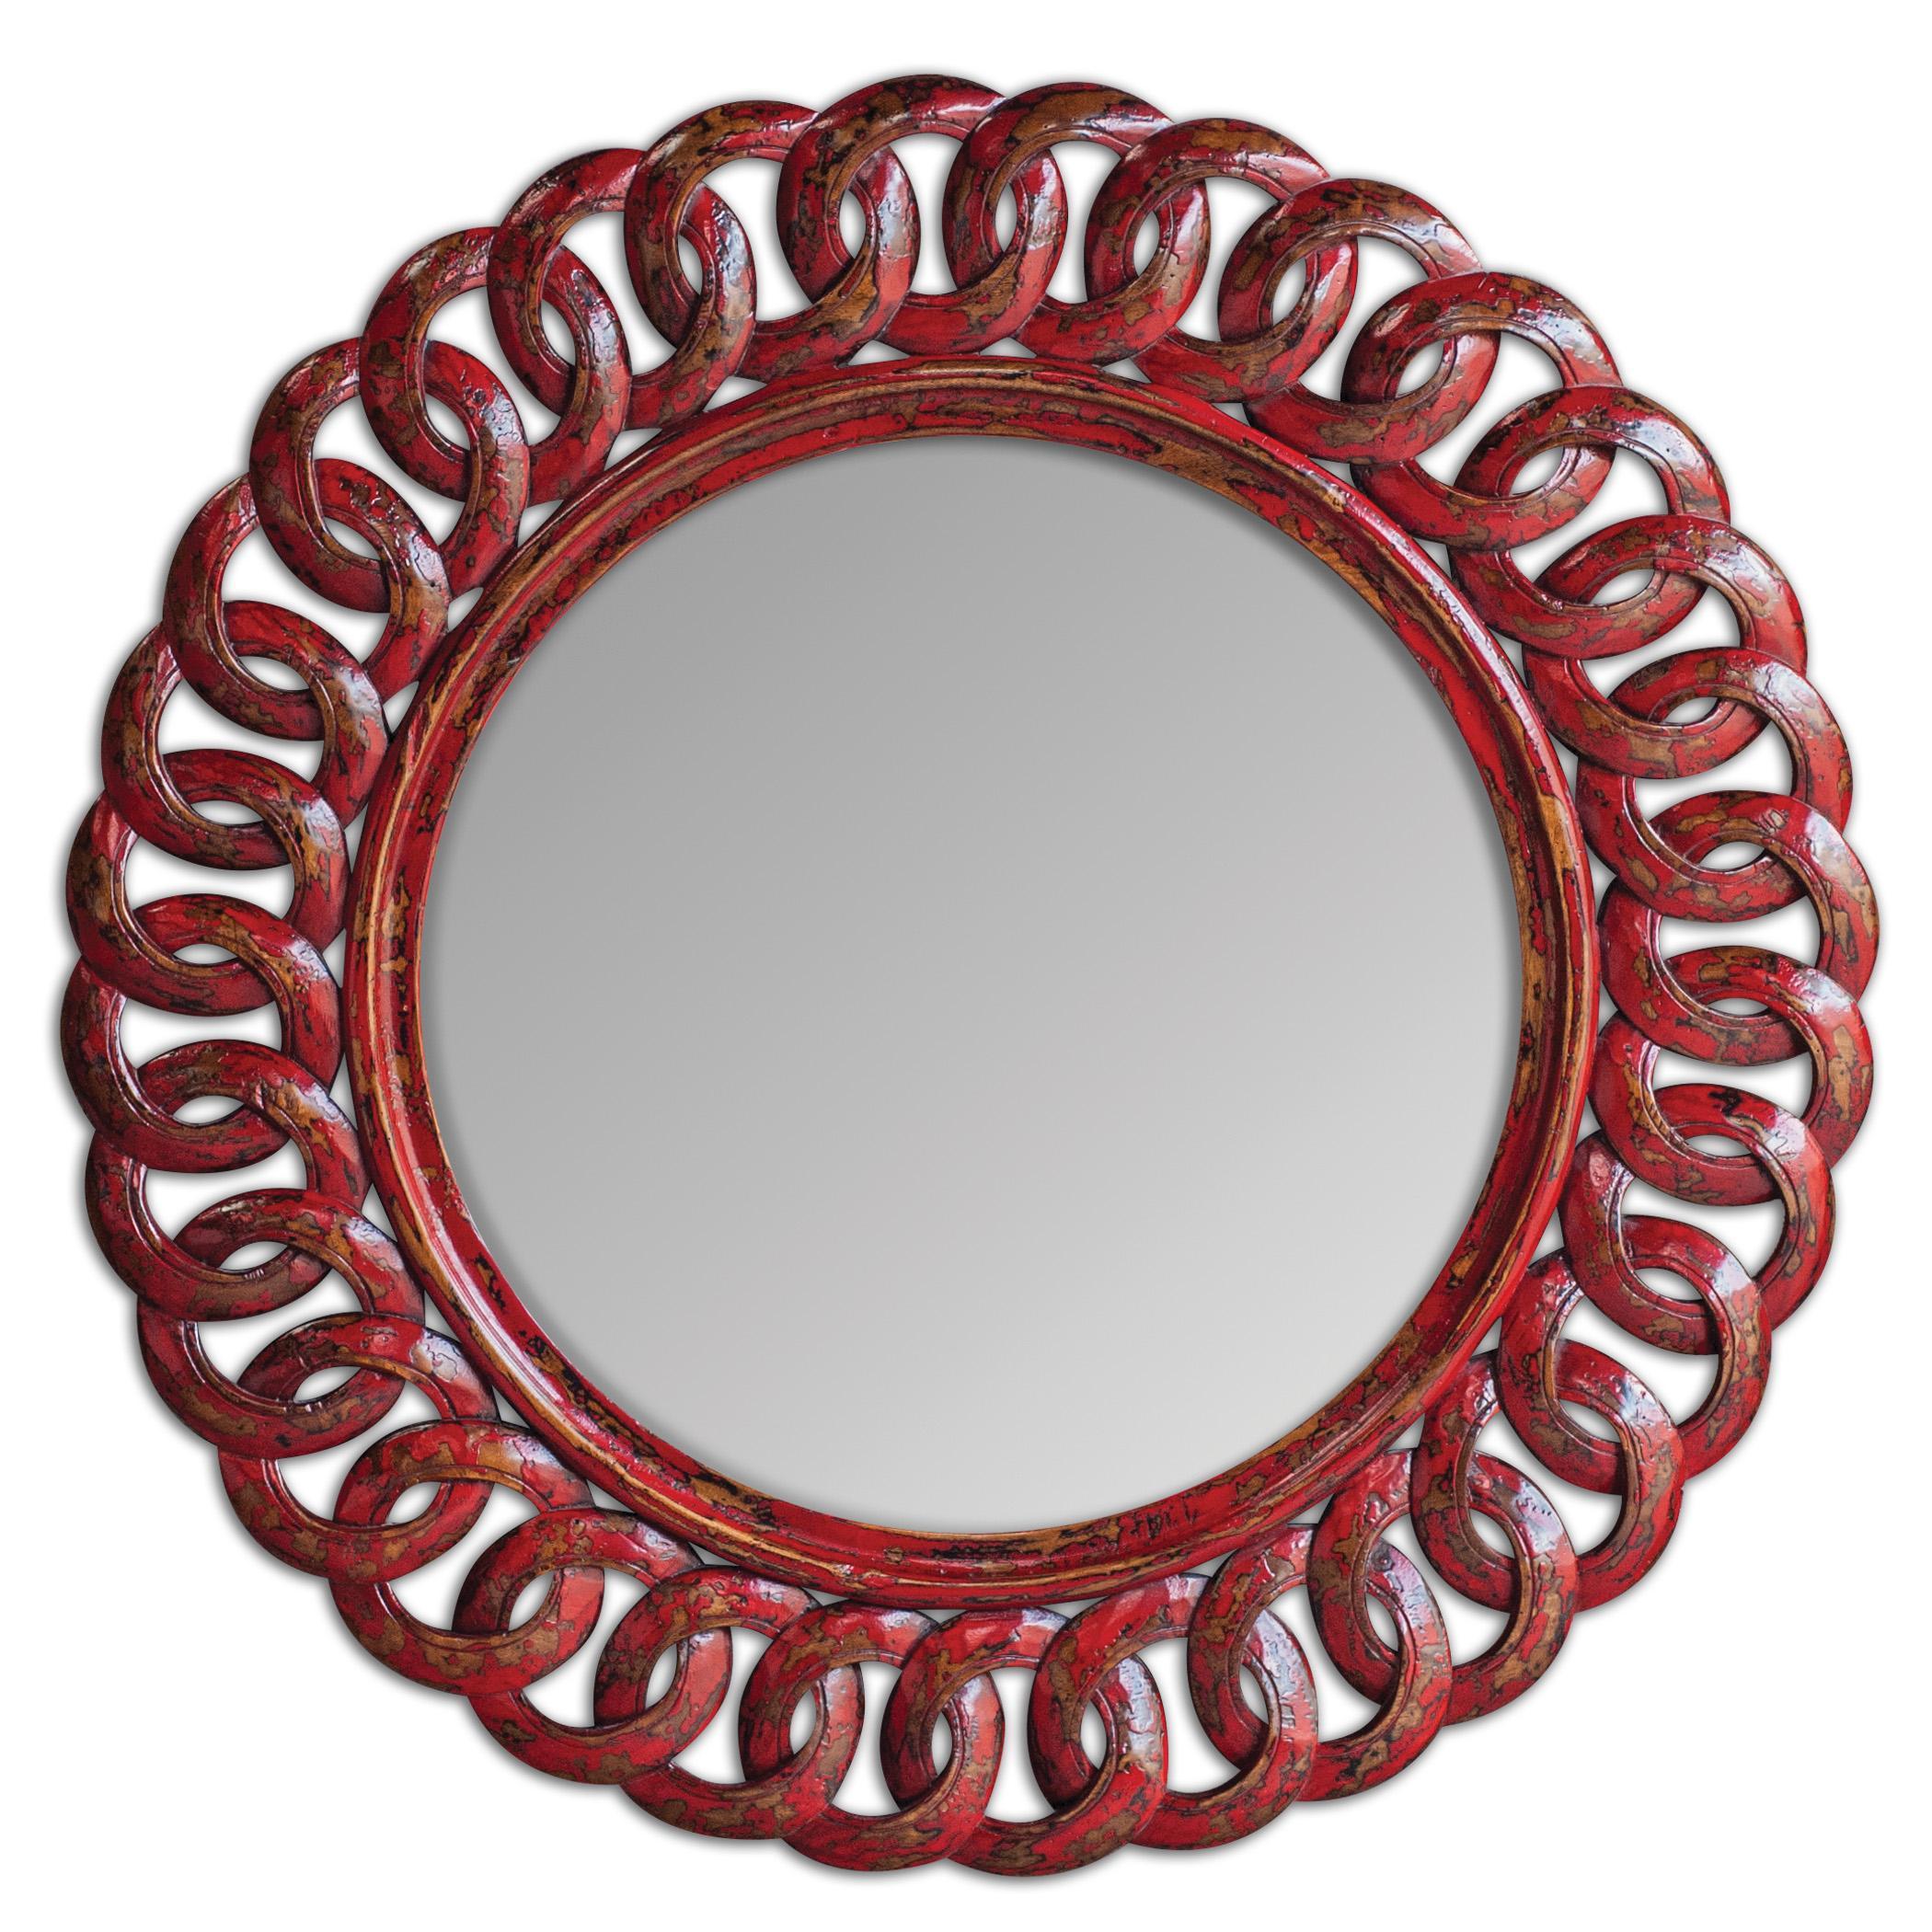 Uttermost Mirrors Sassia Red Round Mirror - Item Number: 05029